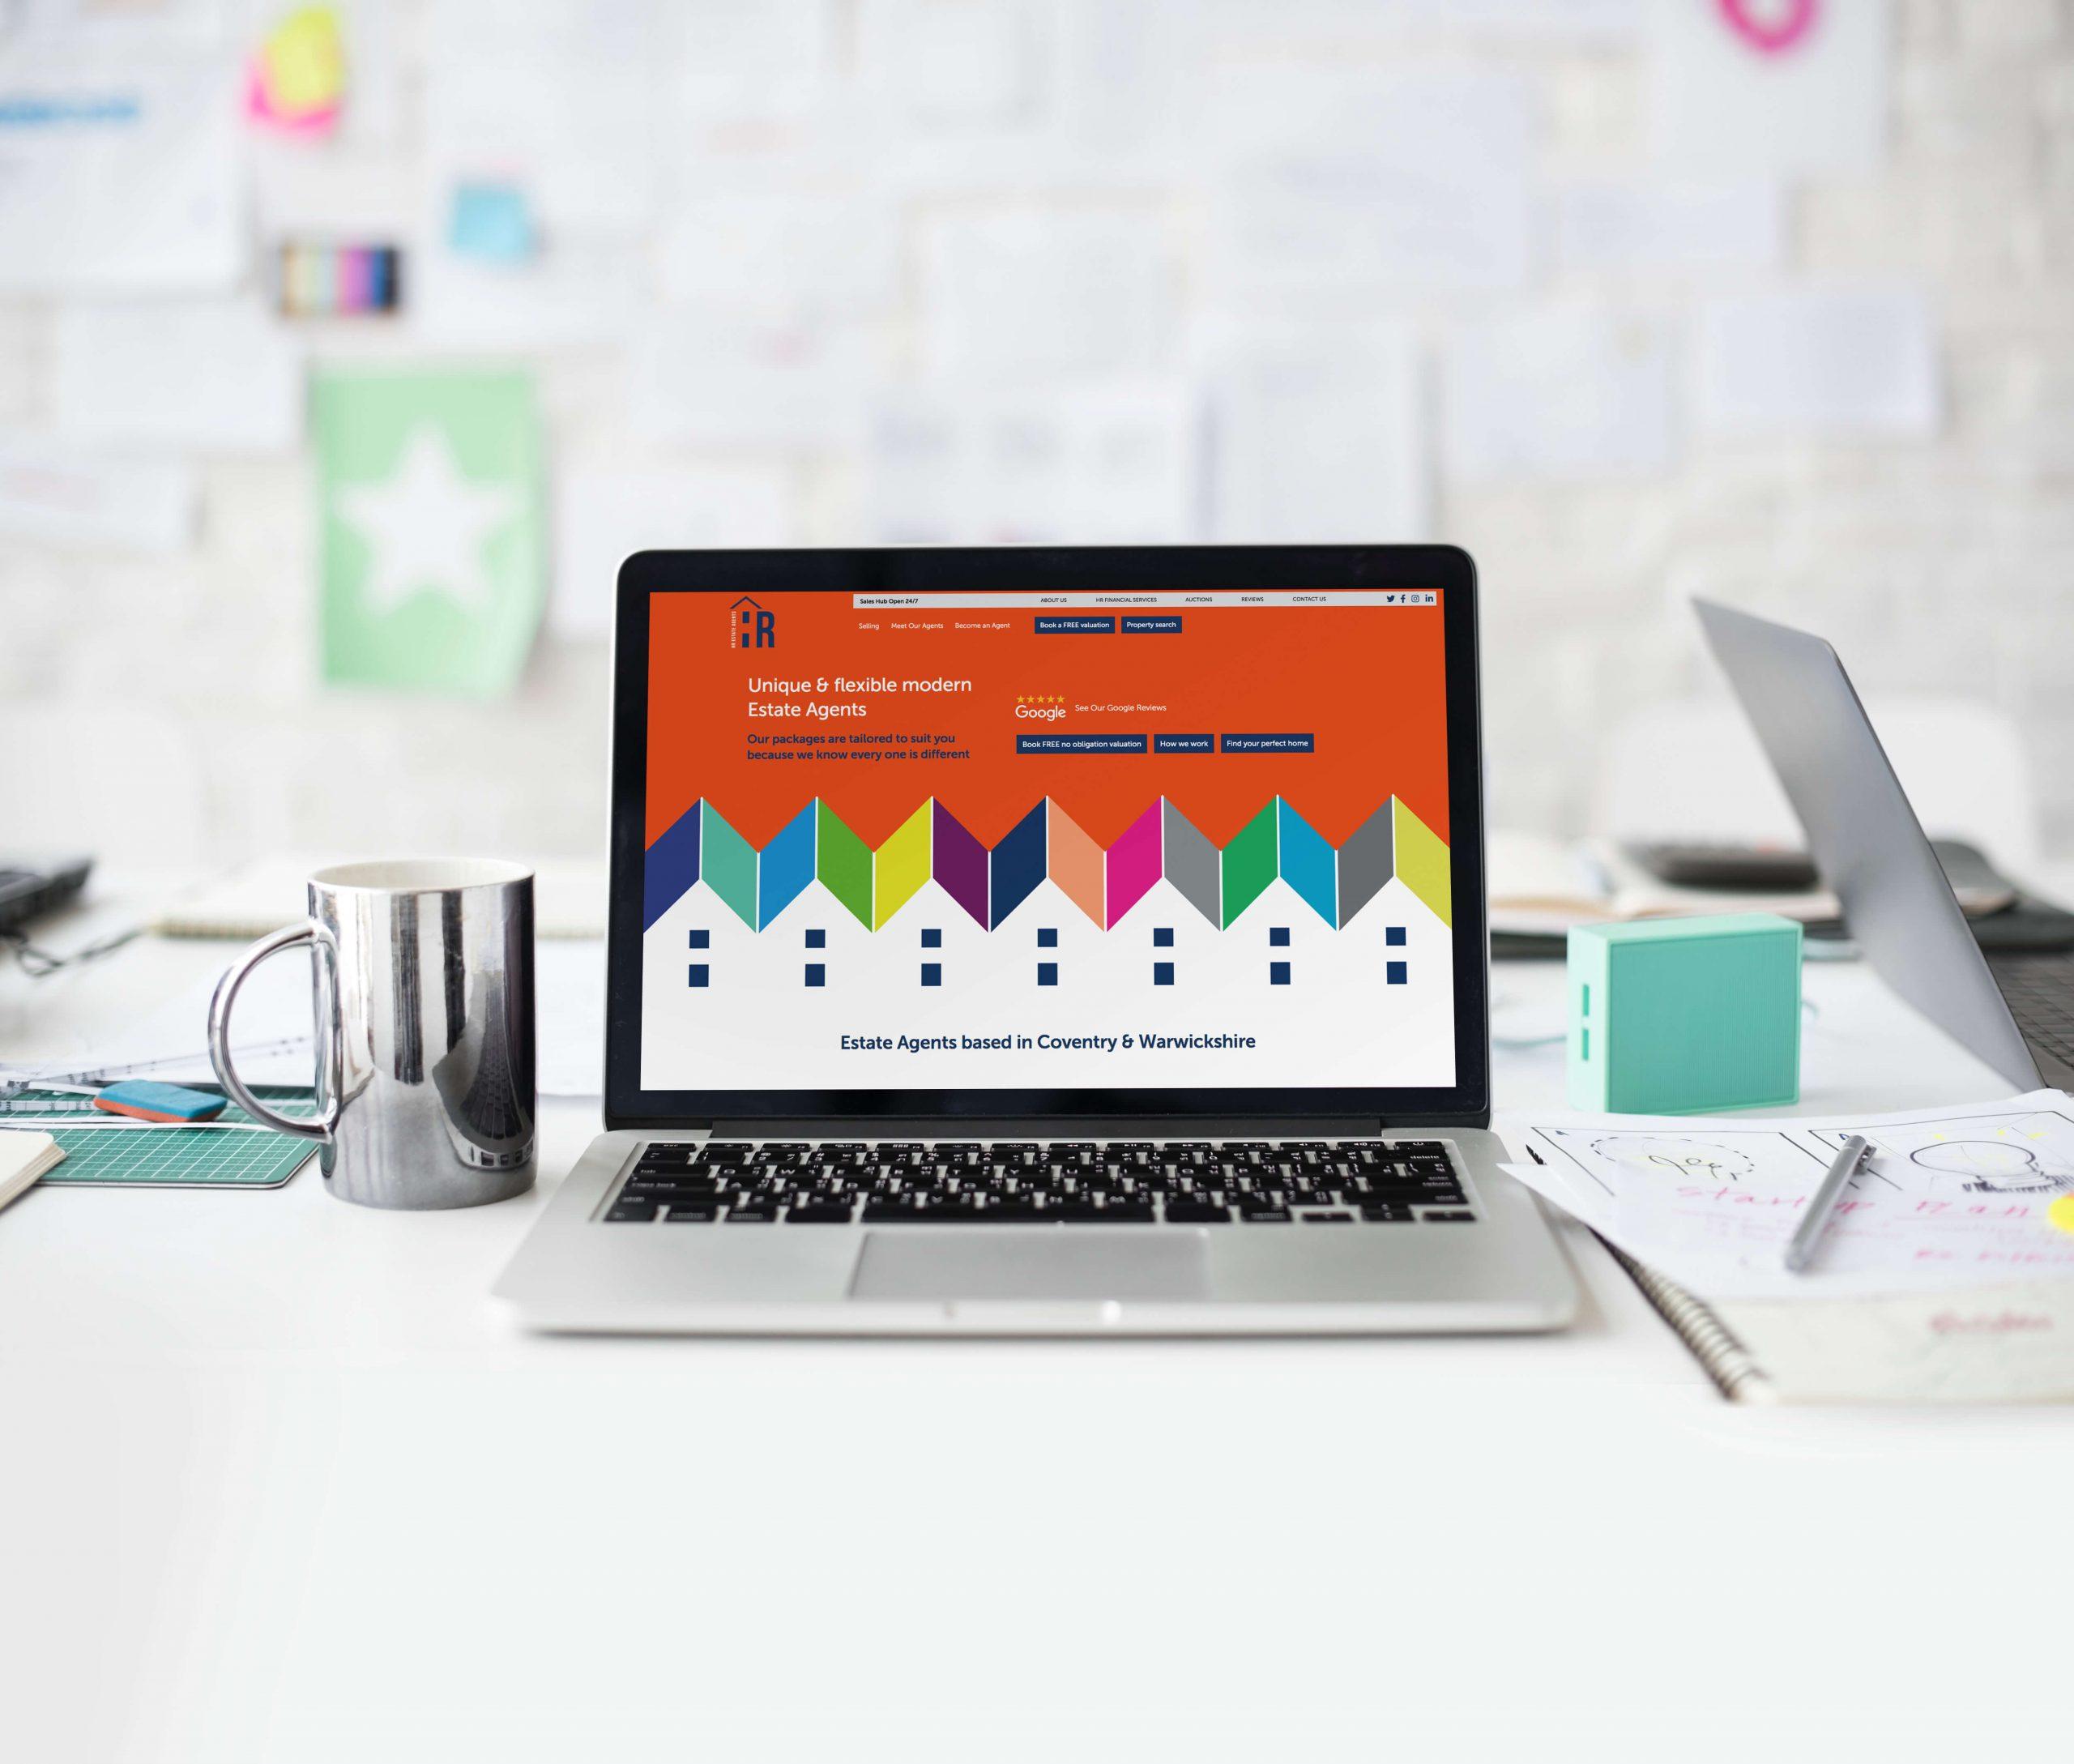 Website Design for HR Estate Agents Coventry